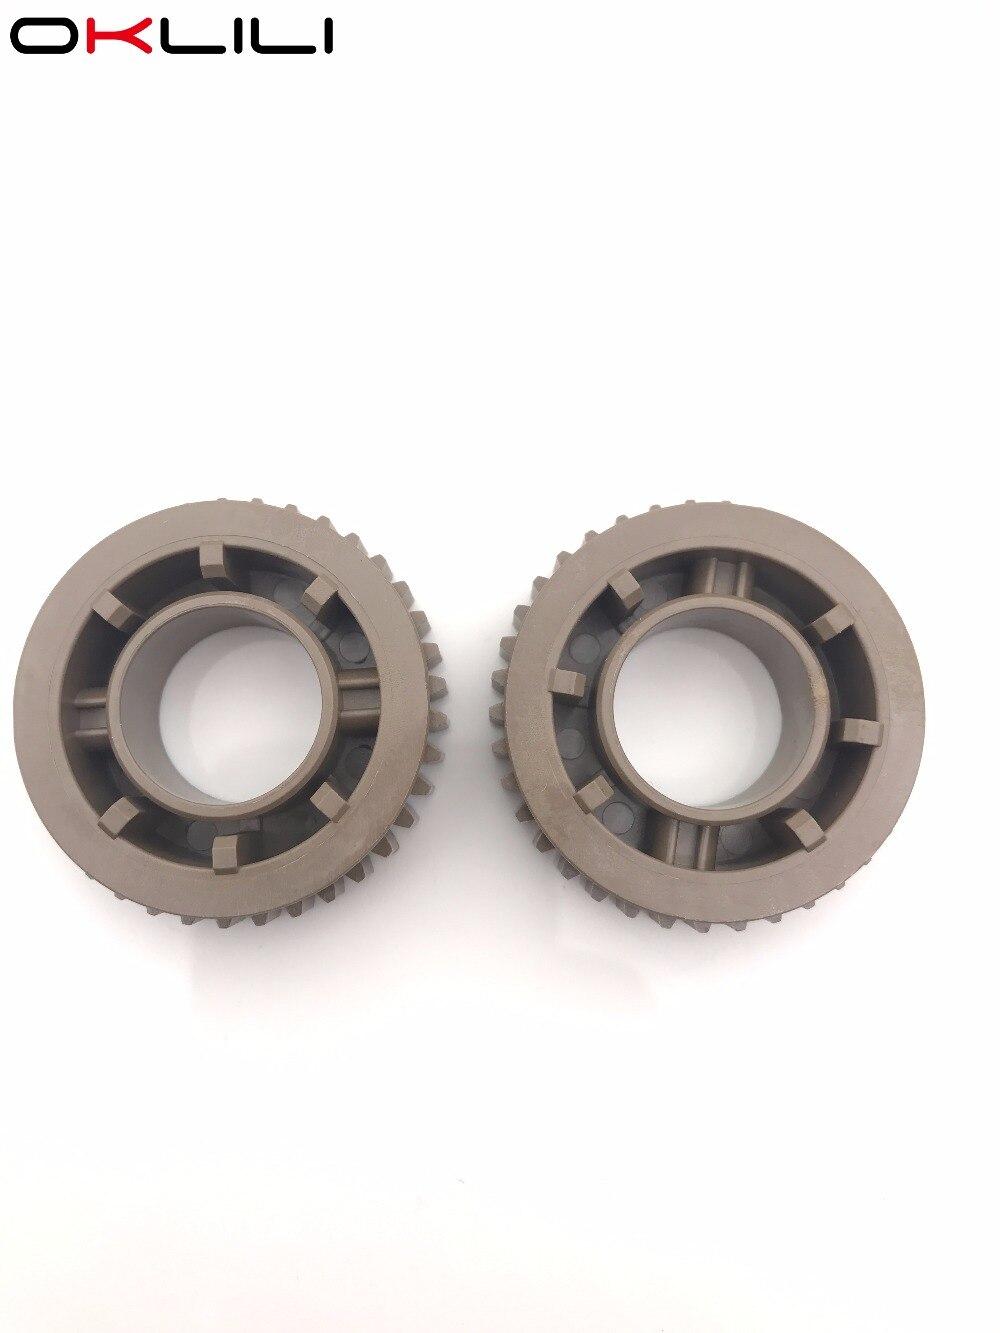 50X JC66 01588A Upper Fuser Hot Heat Roller Gear for Samsung ML3050 ML3051 ML3470 ML3471 SCX5330